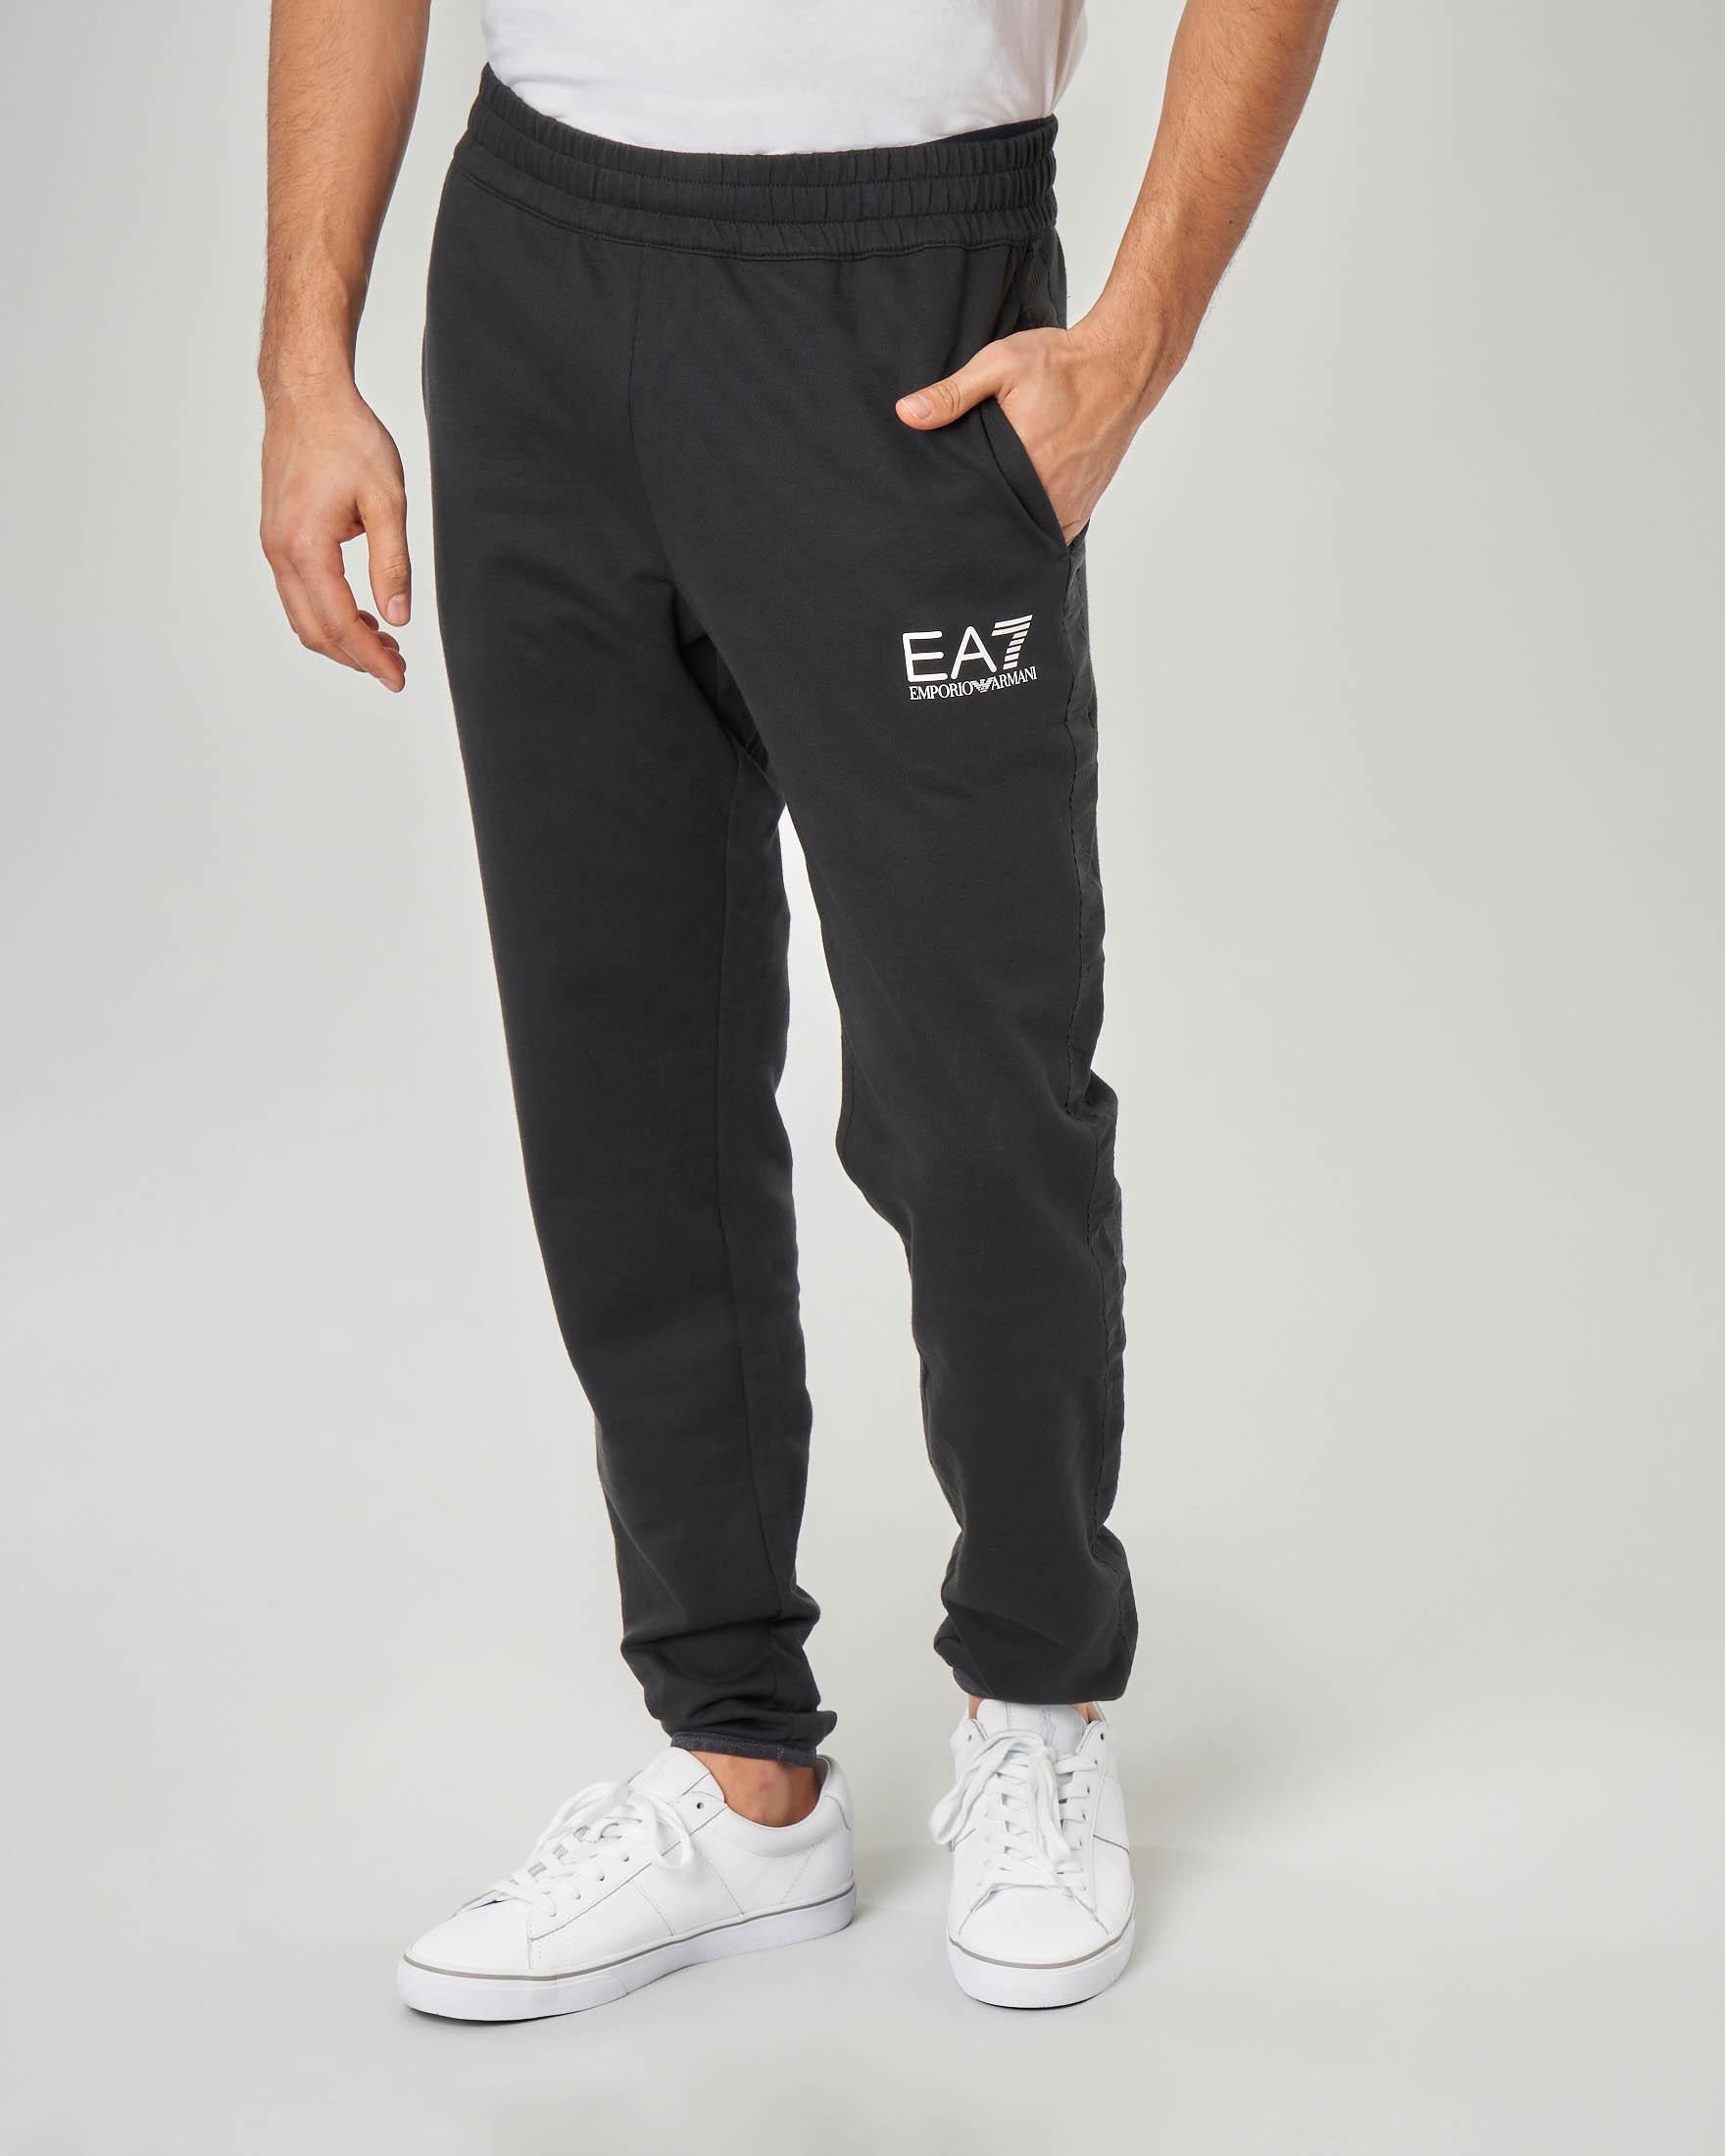 Pantalone nero in felpa con banda